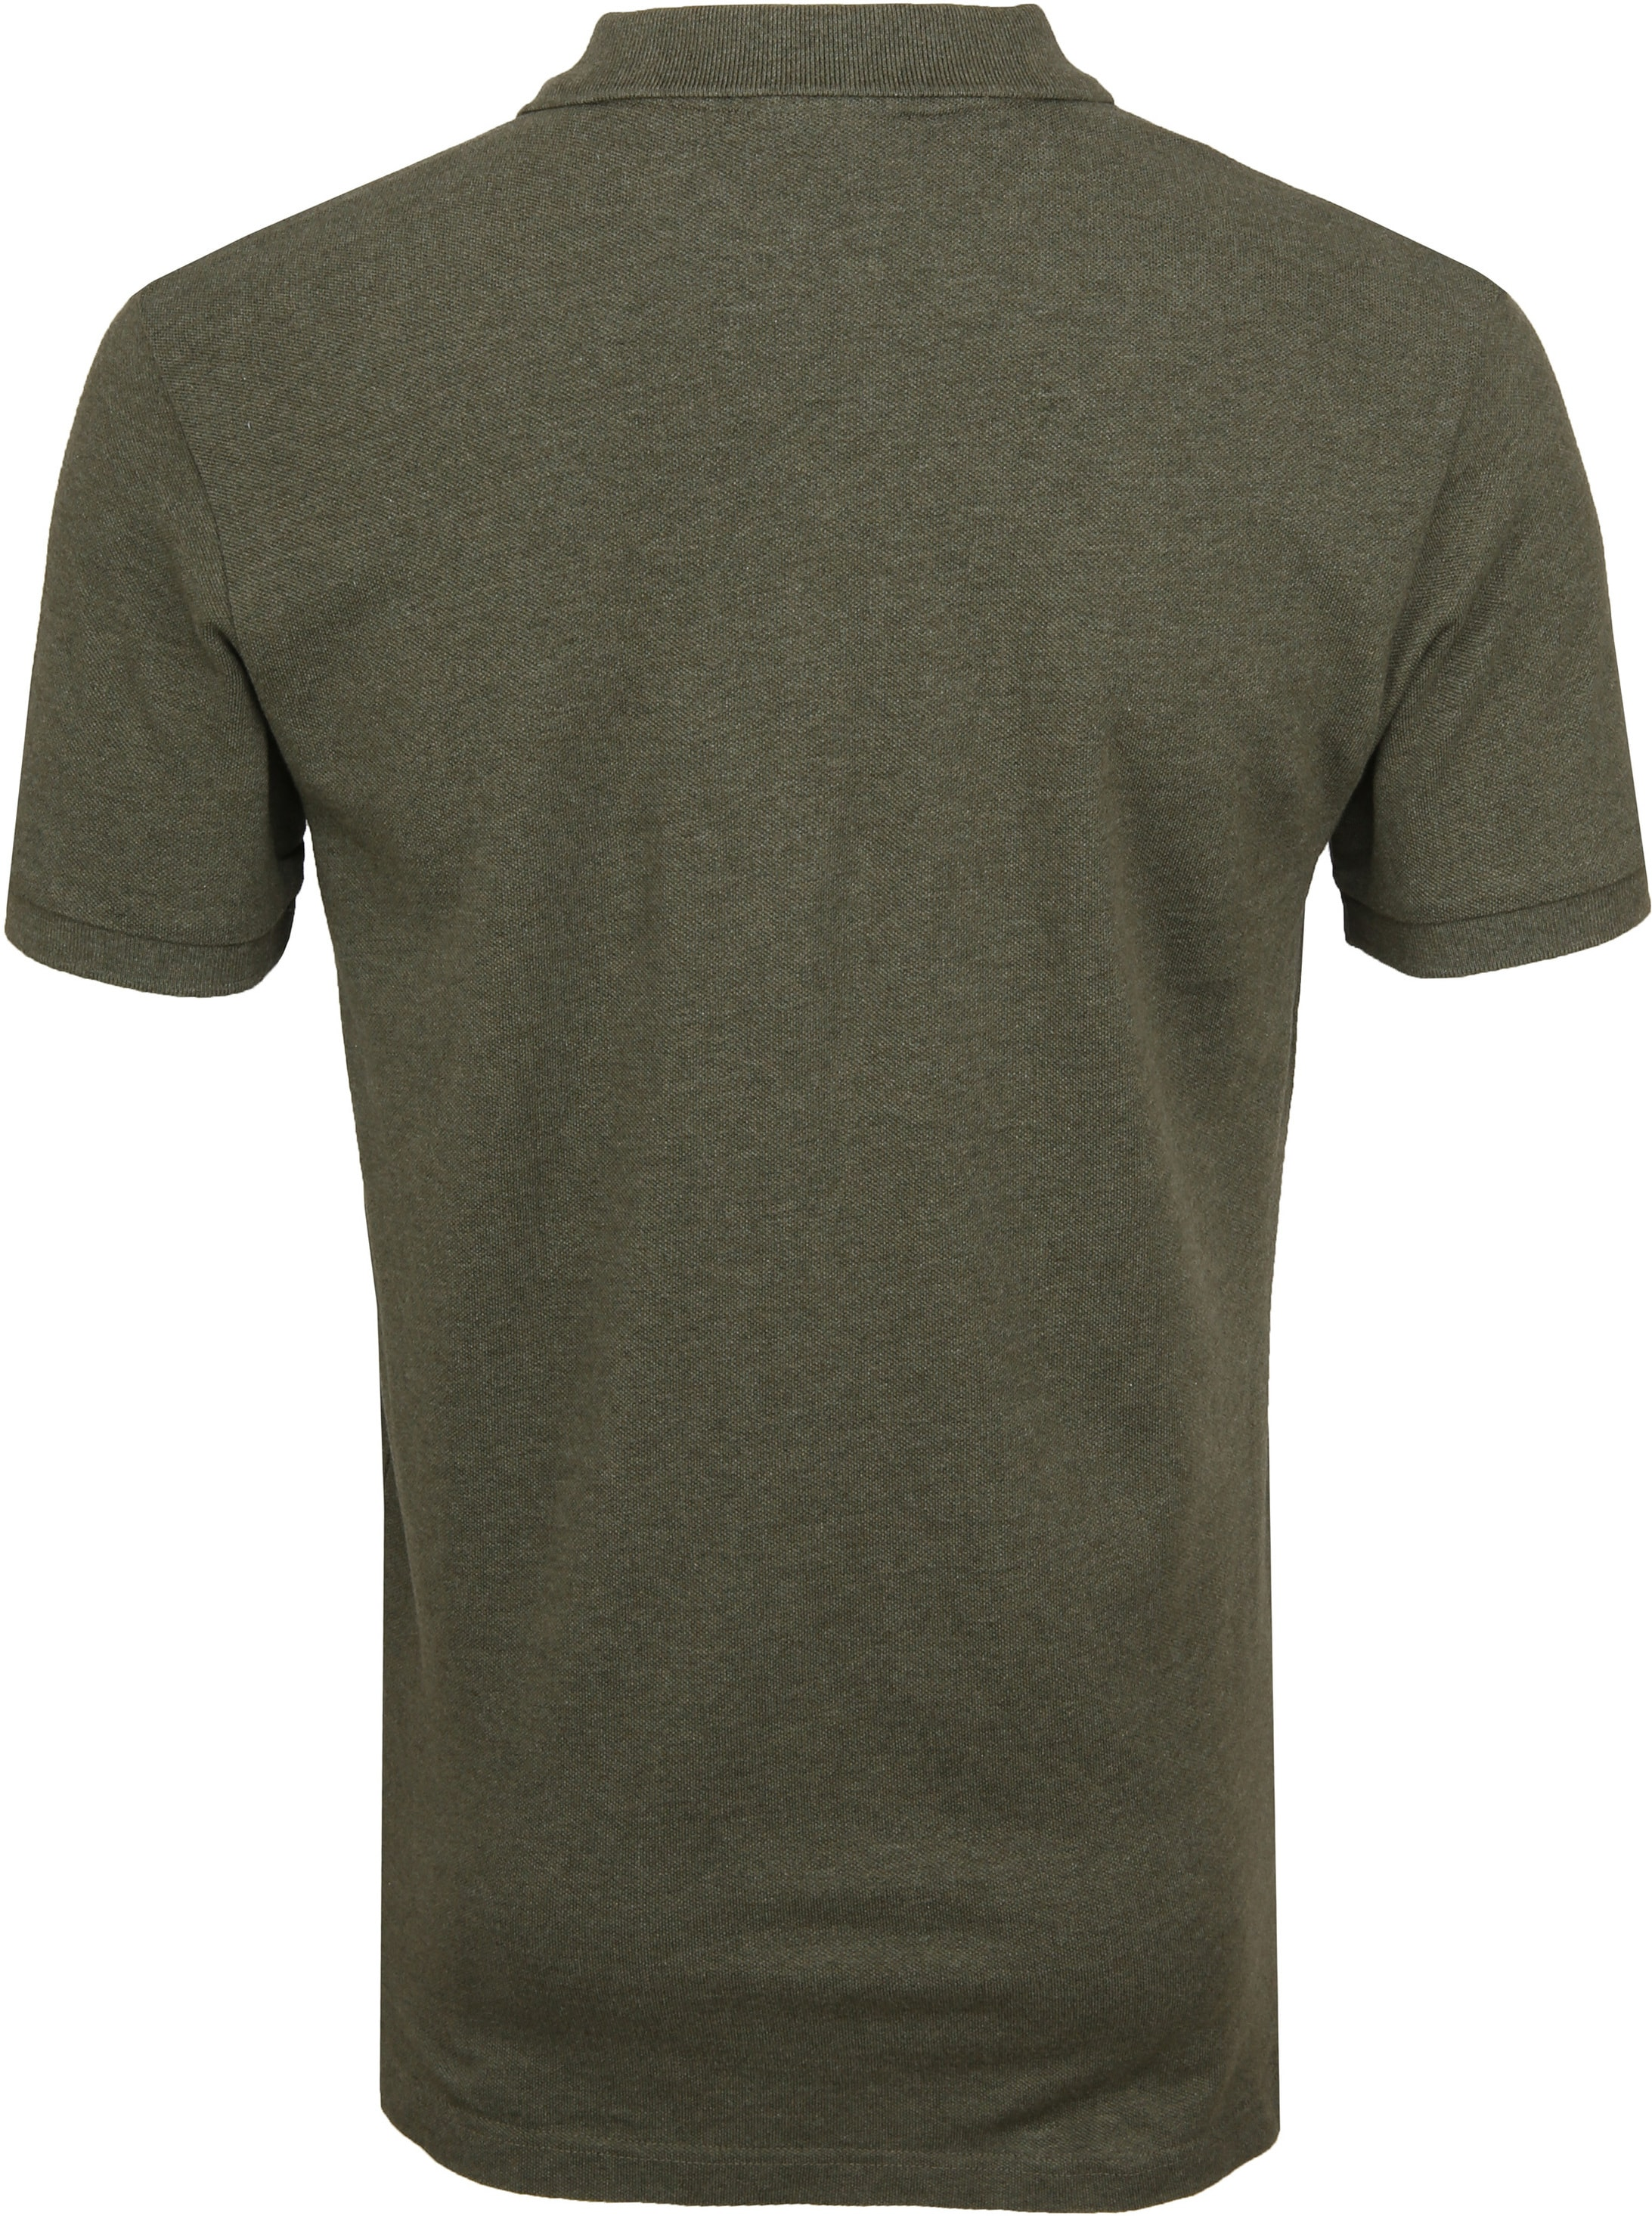 Profuomo Short Sleeve Poloshirt Army foto 3